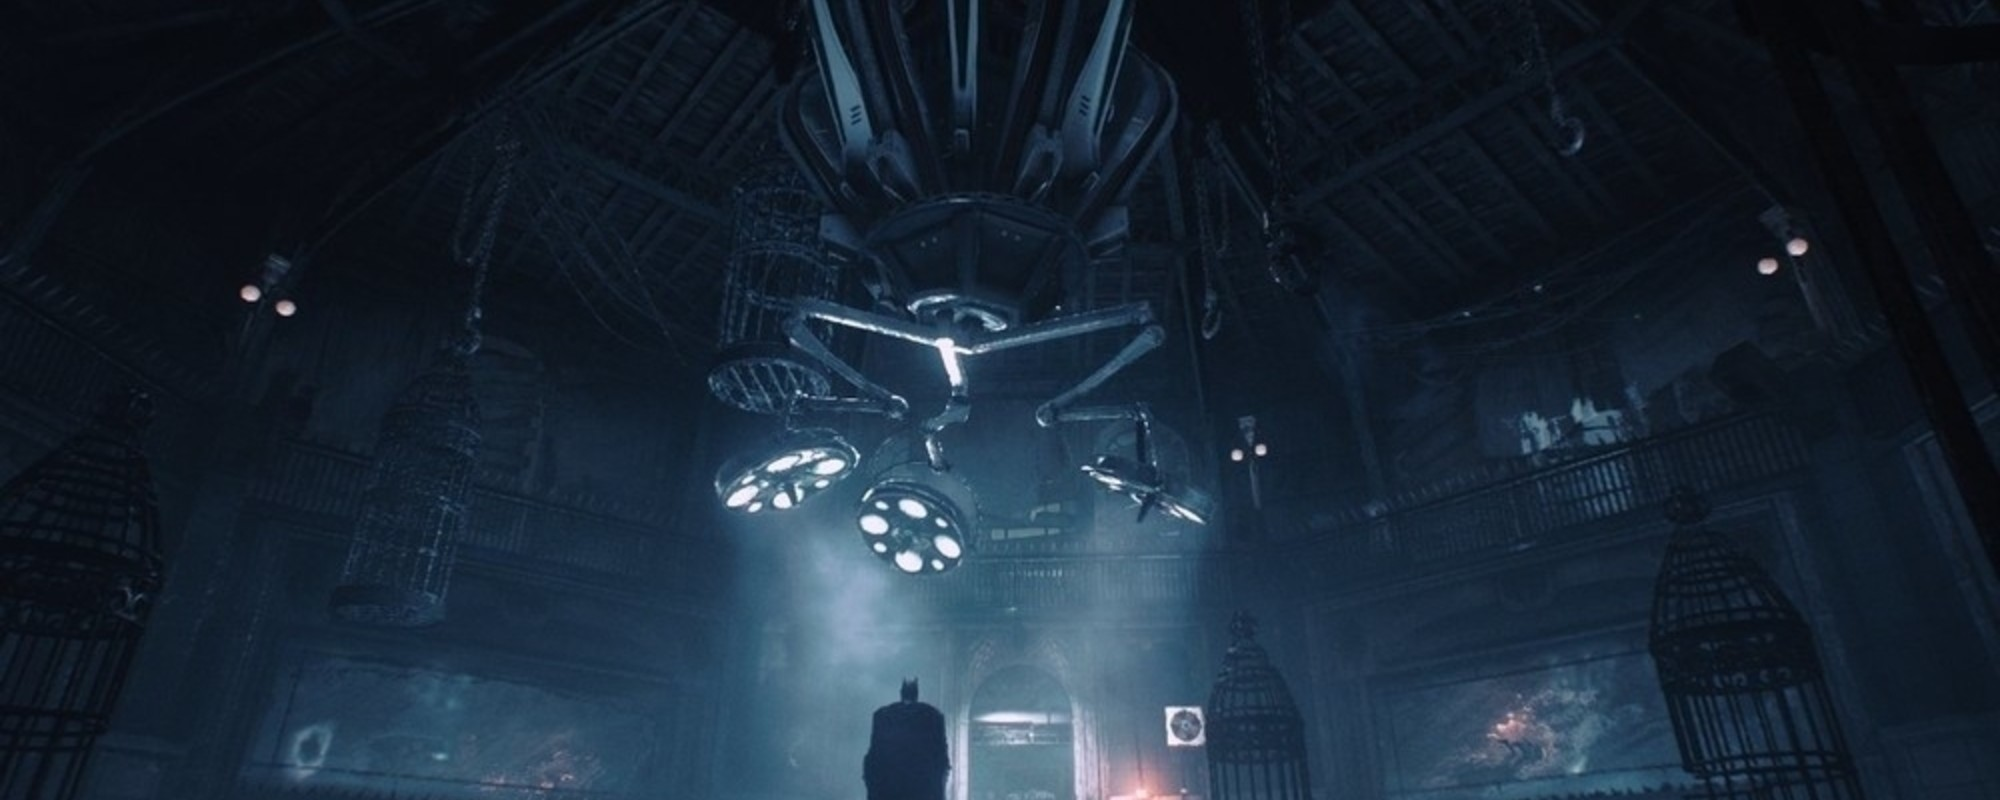 El hermoso universo de 'Batman: Arkham Knight'